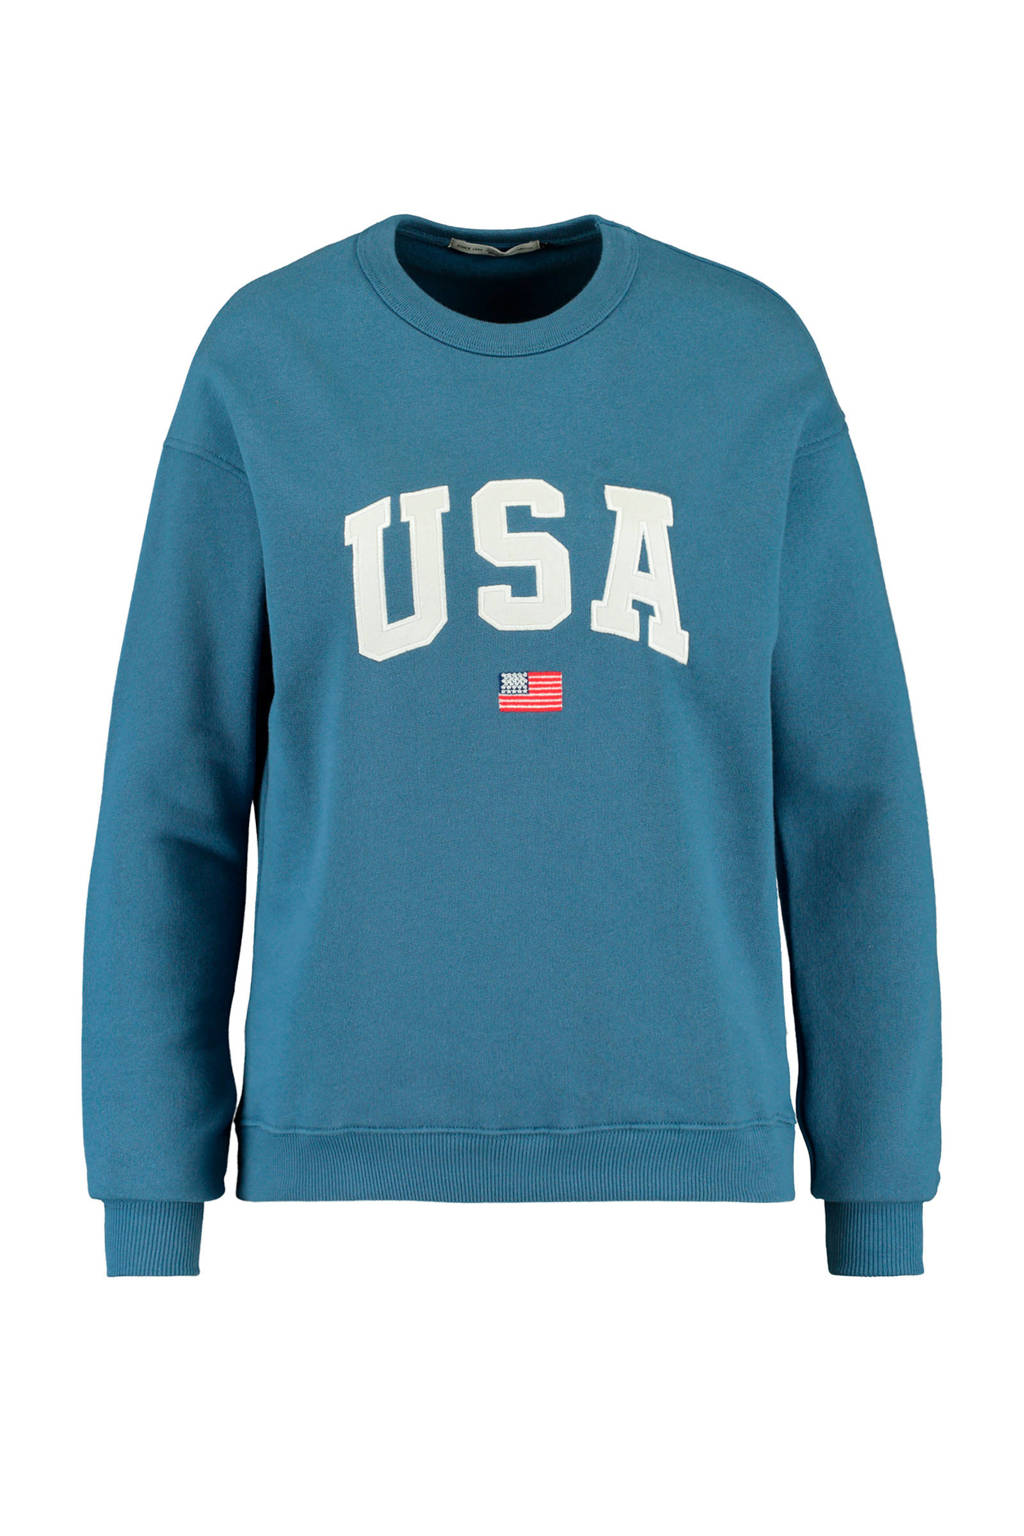 America Today sweater met logo blauw, Blauw